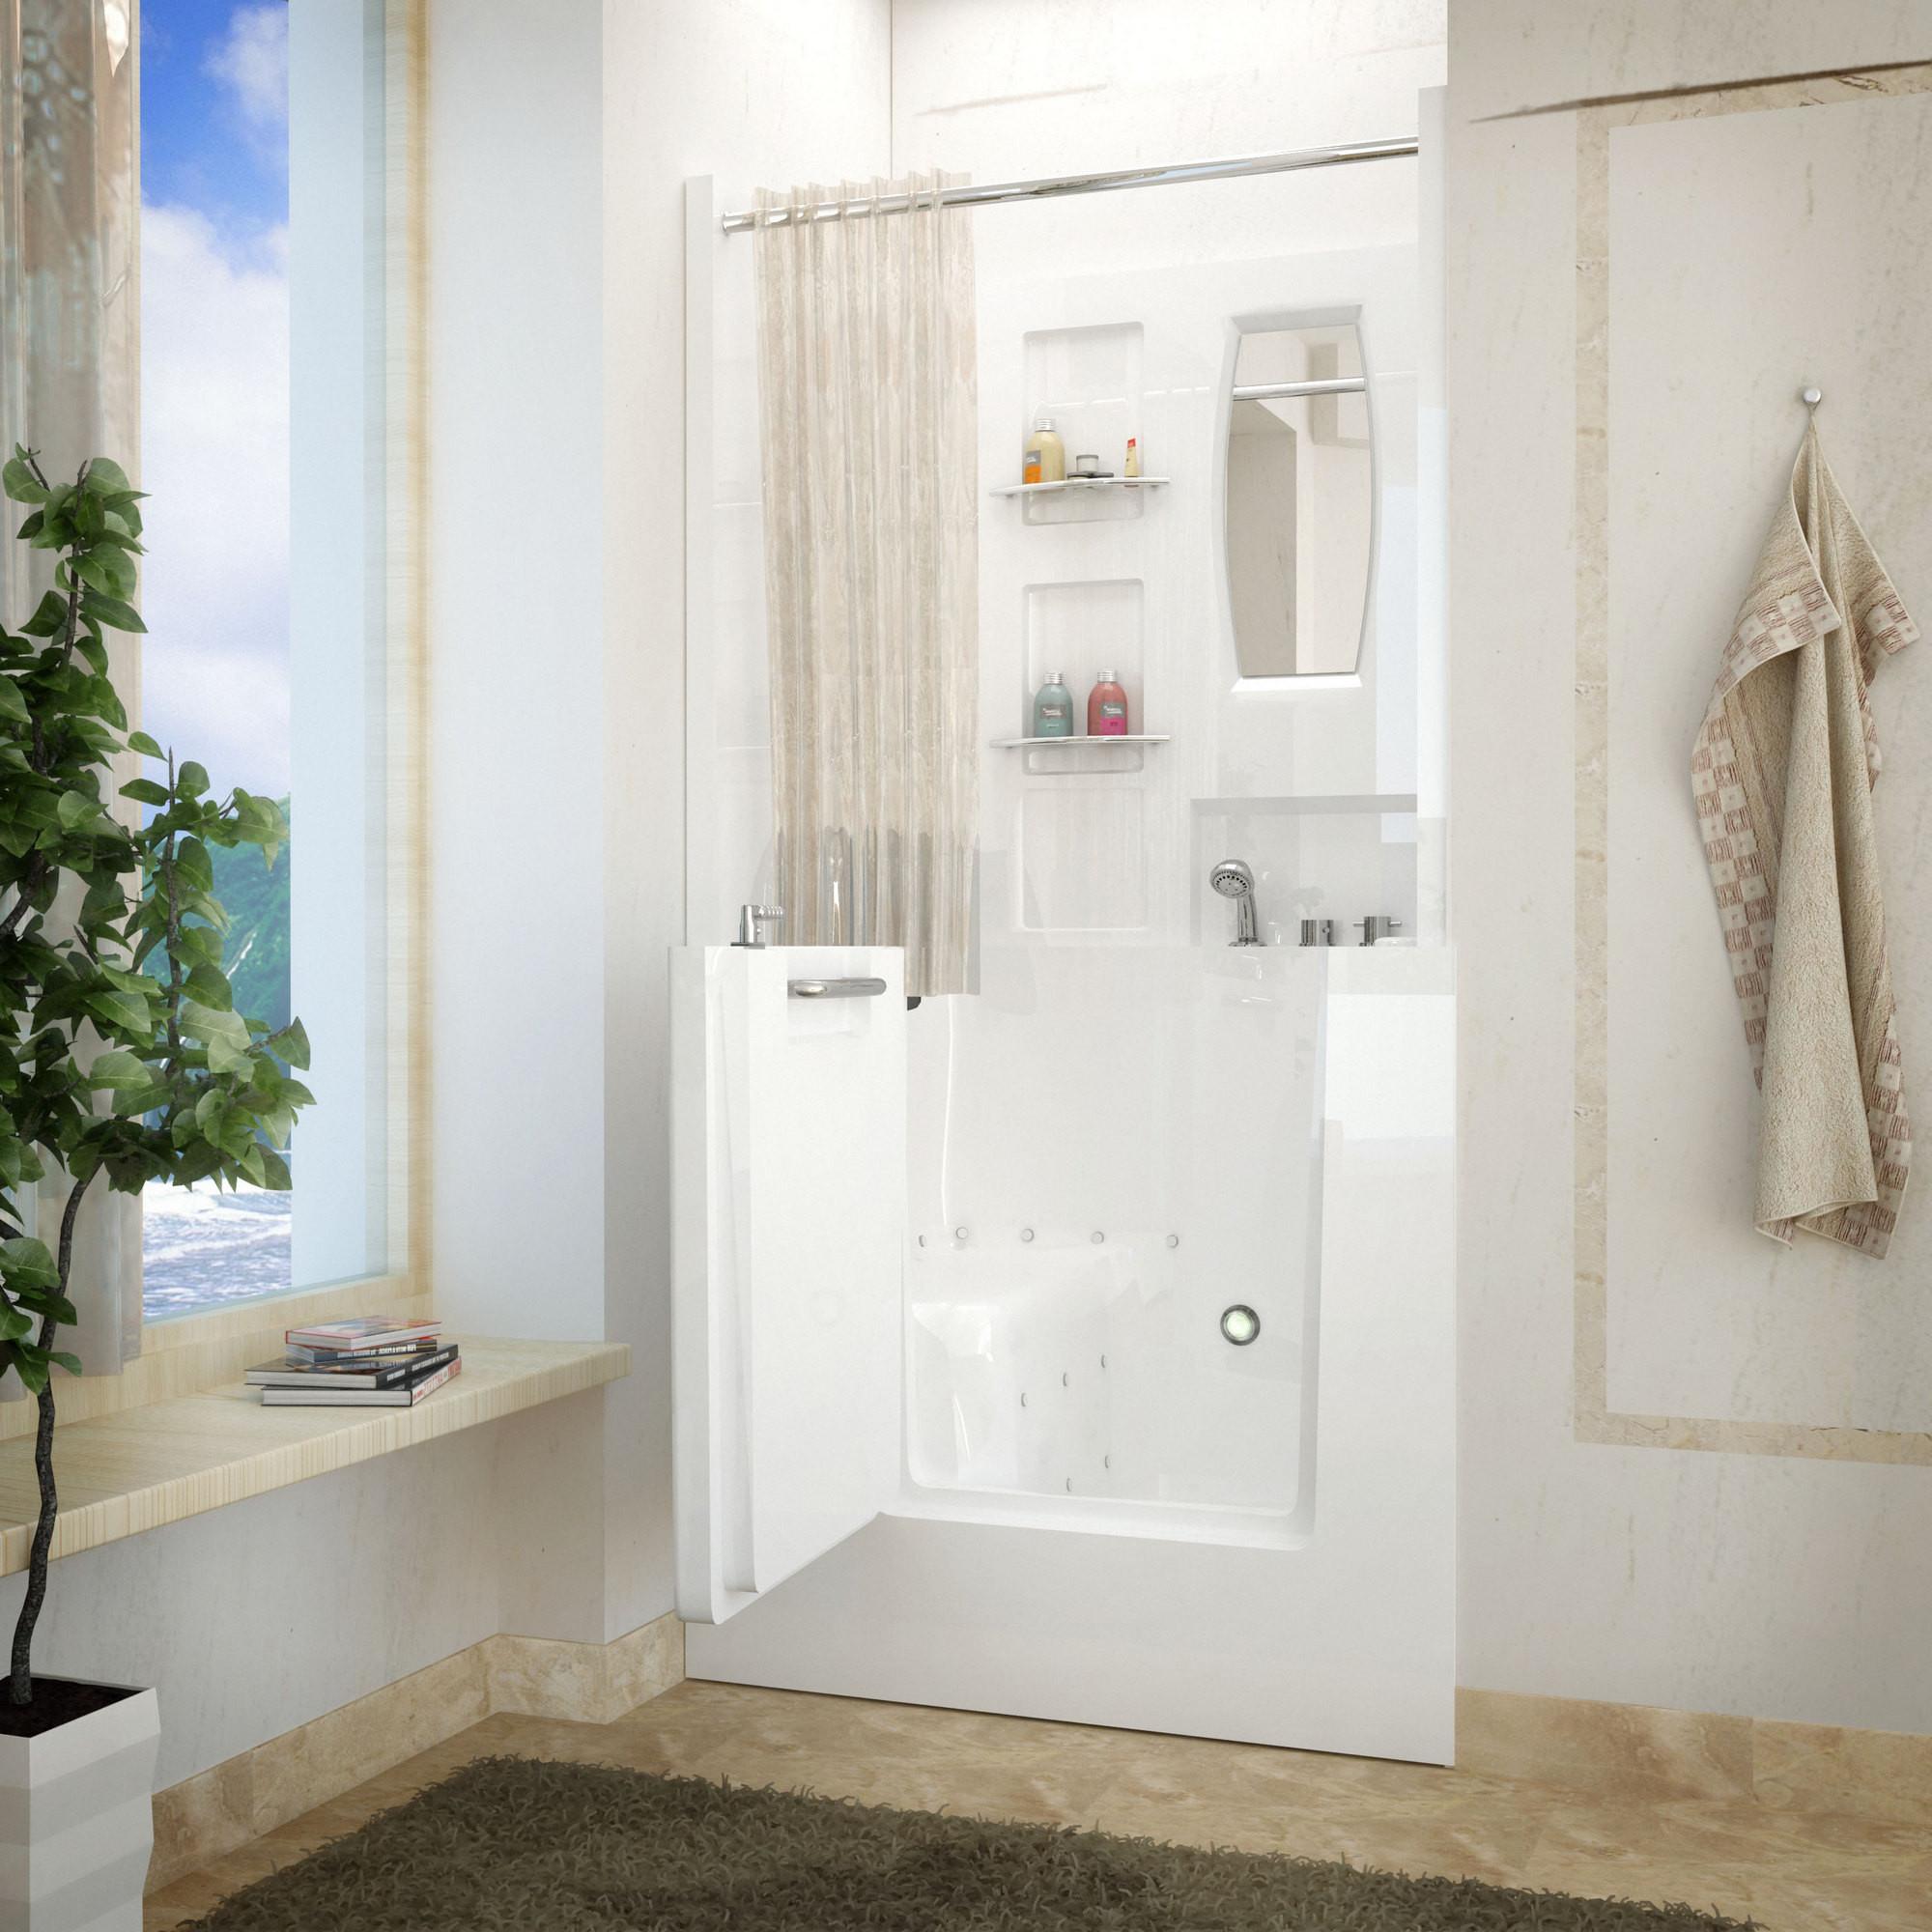 MediTub 3140RWA Walk-In 31 x 40 Right Drain White Air Jetted Bathtub